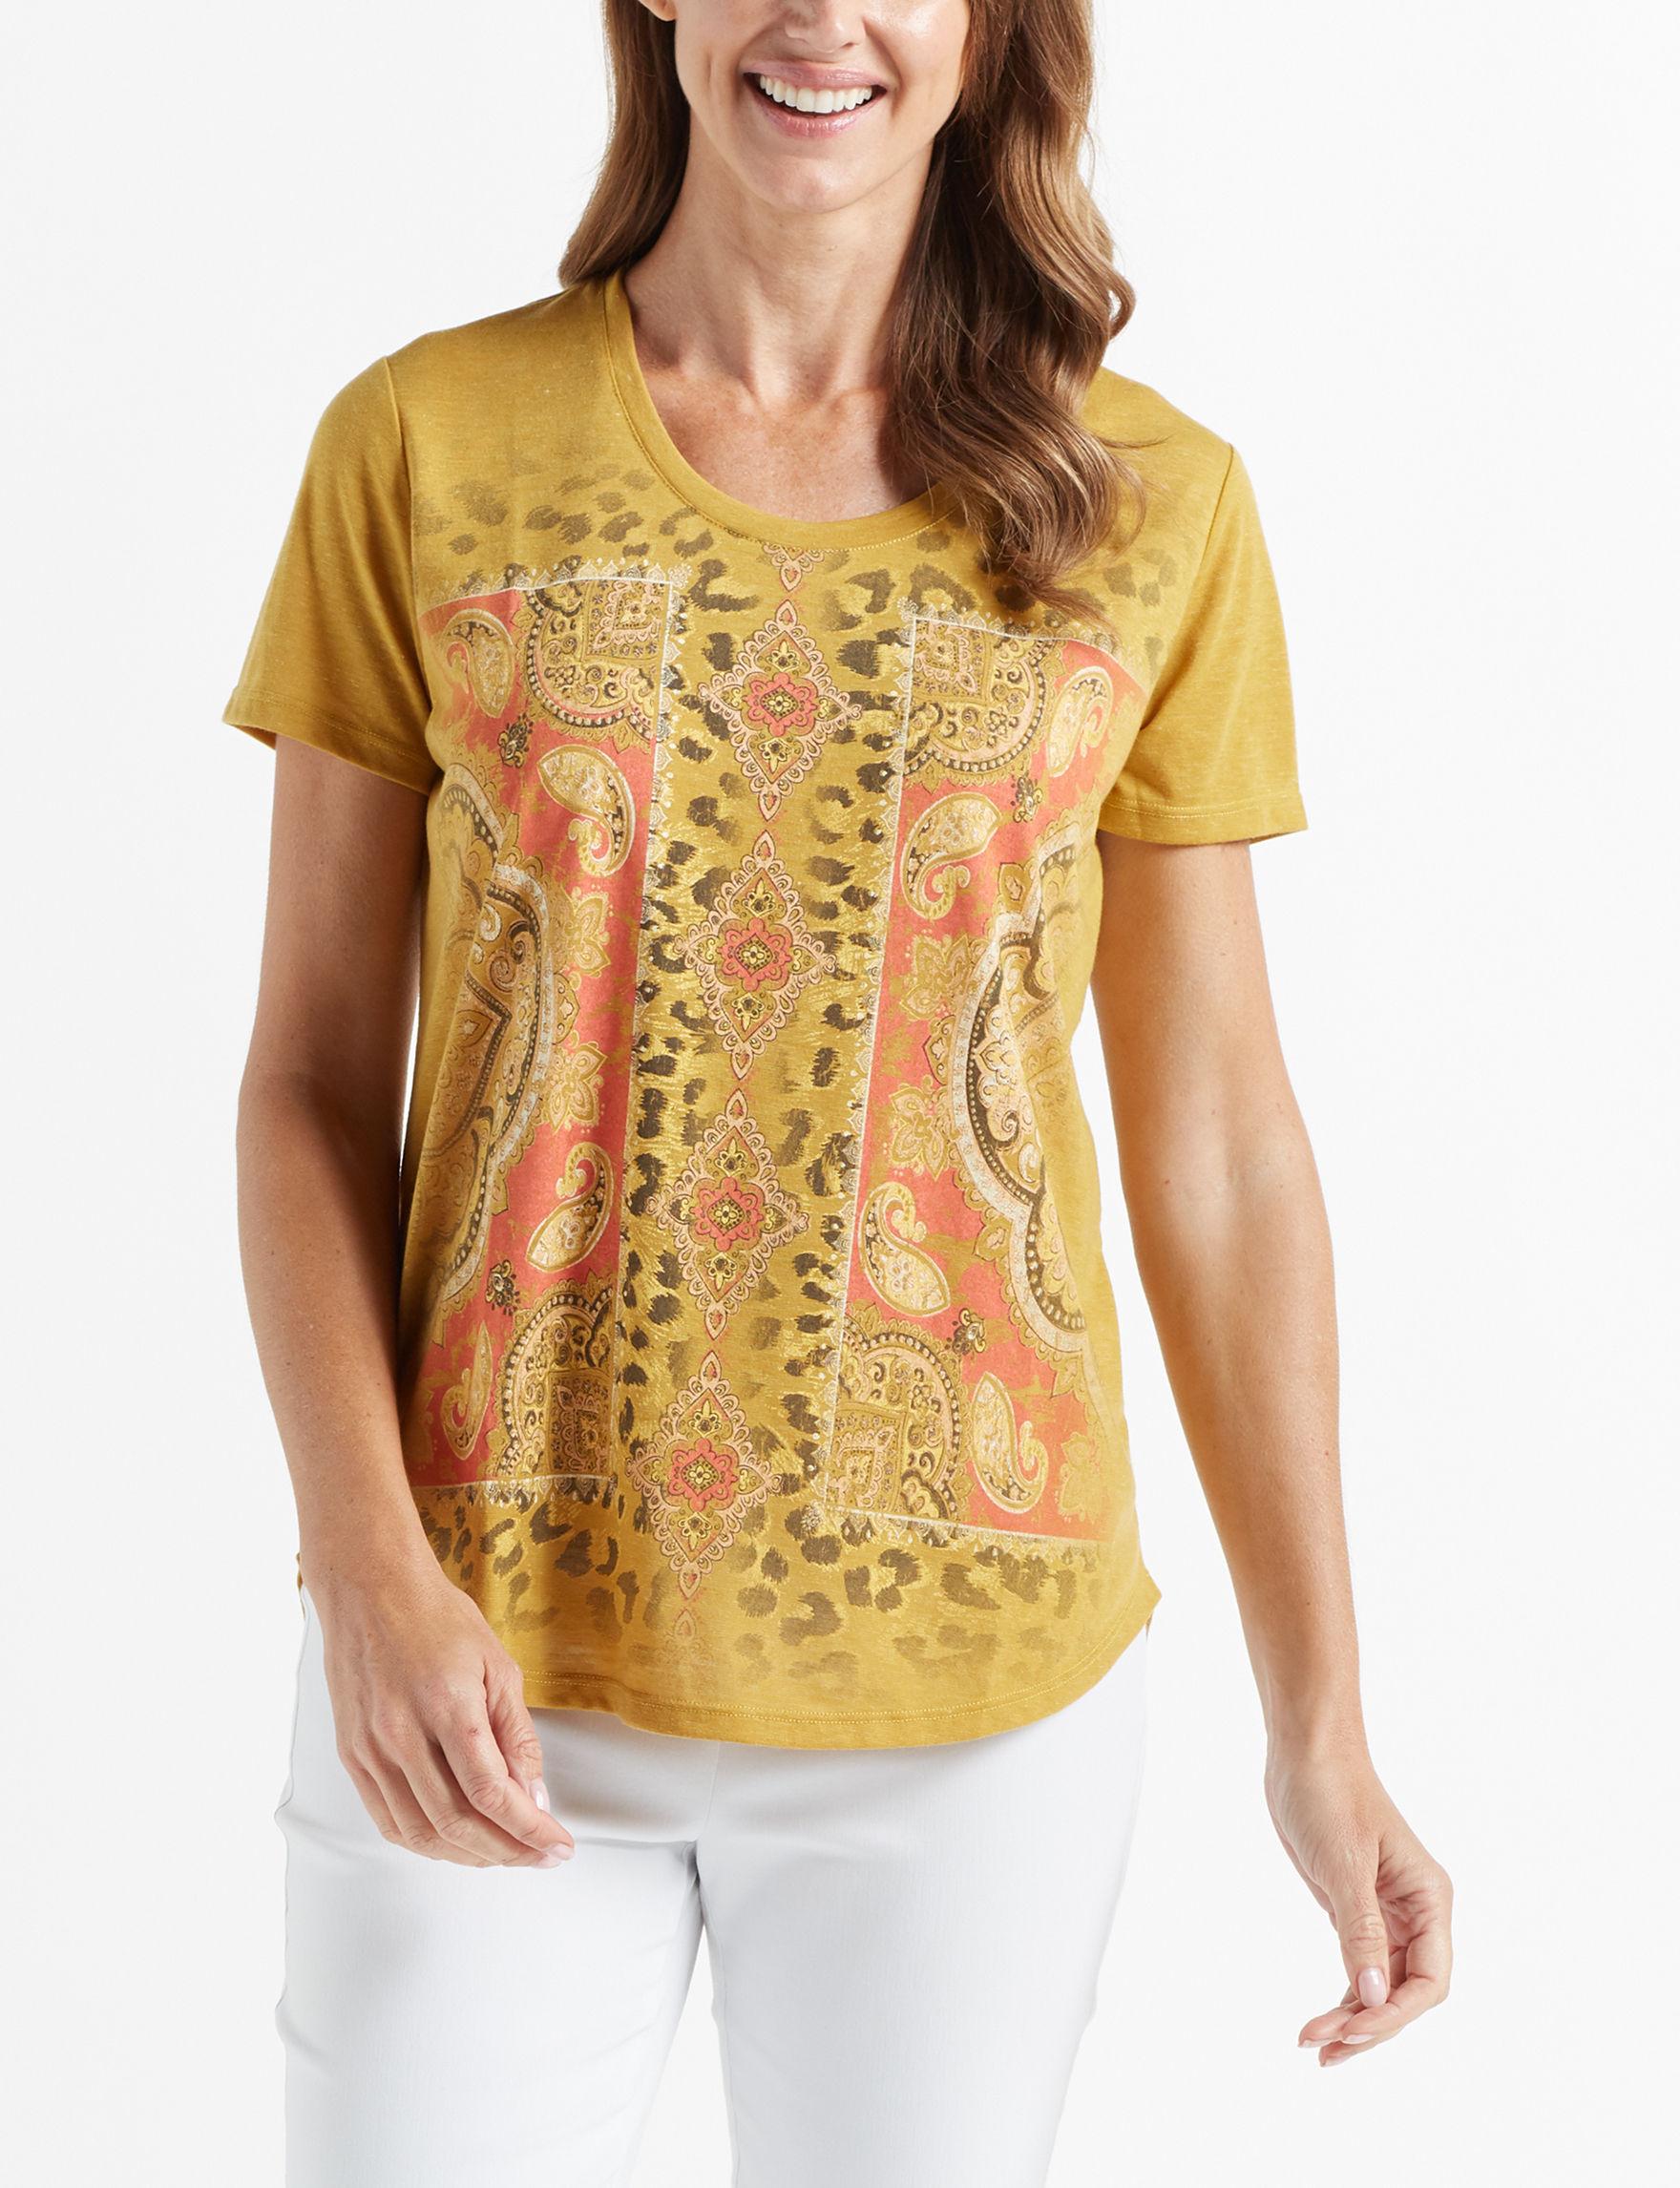 Mic & Jax Amber Shirts & Blouses